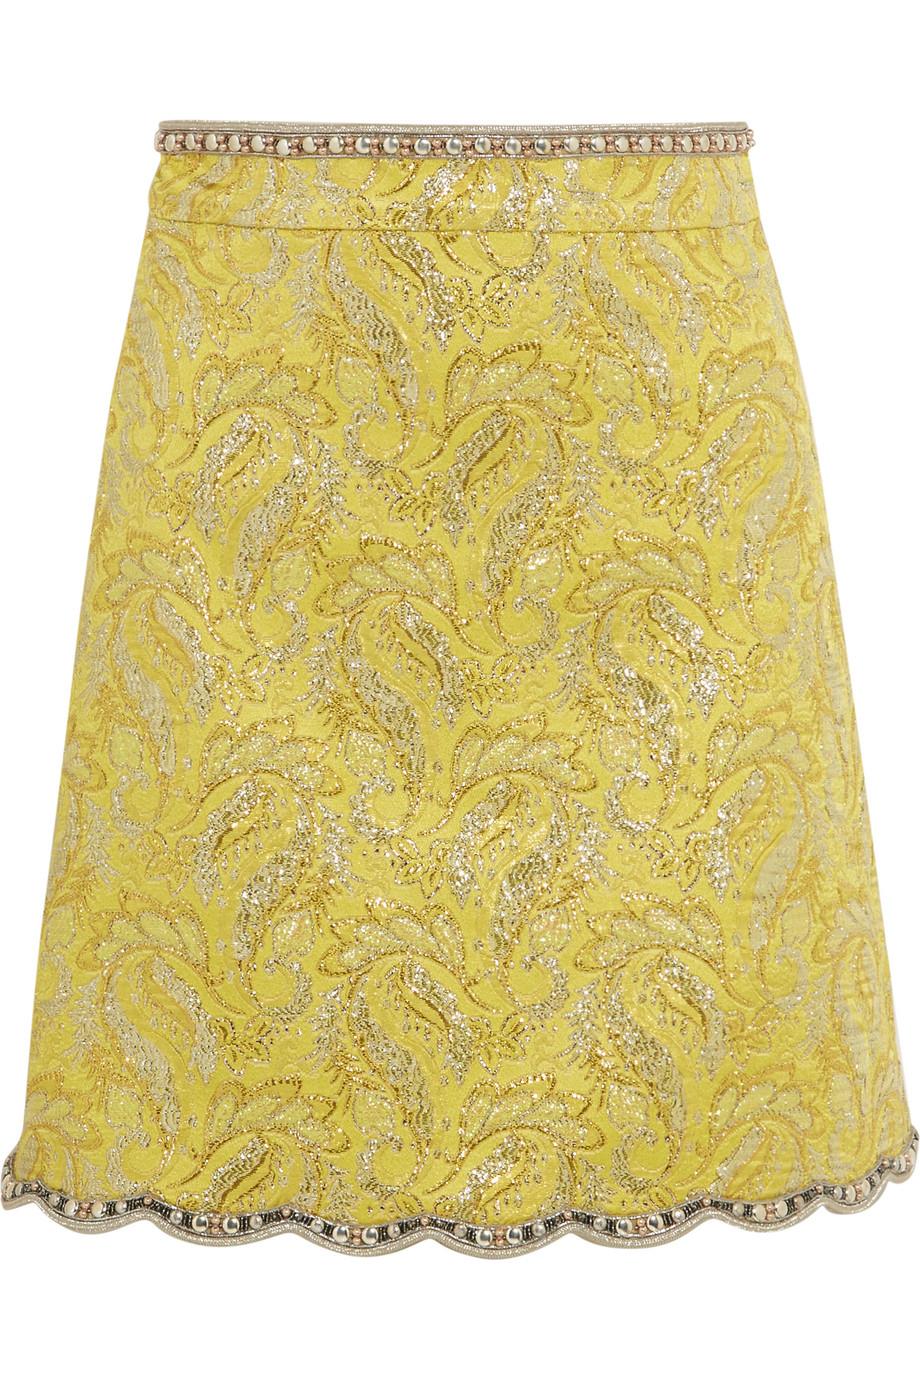 Gucci Embellished Metallic Brocade Mini Skirt, Yellow, Women's, Size: 38